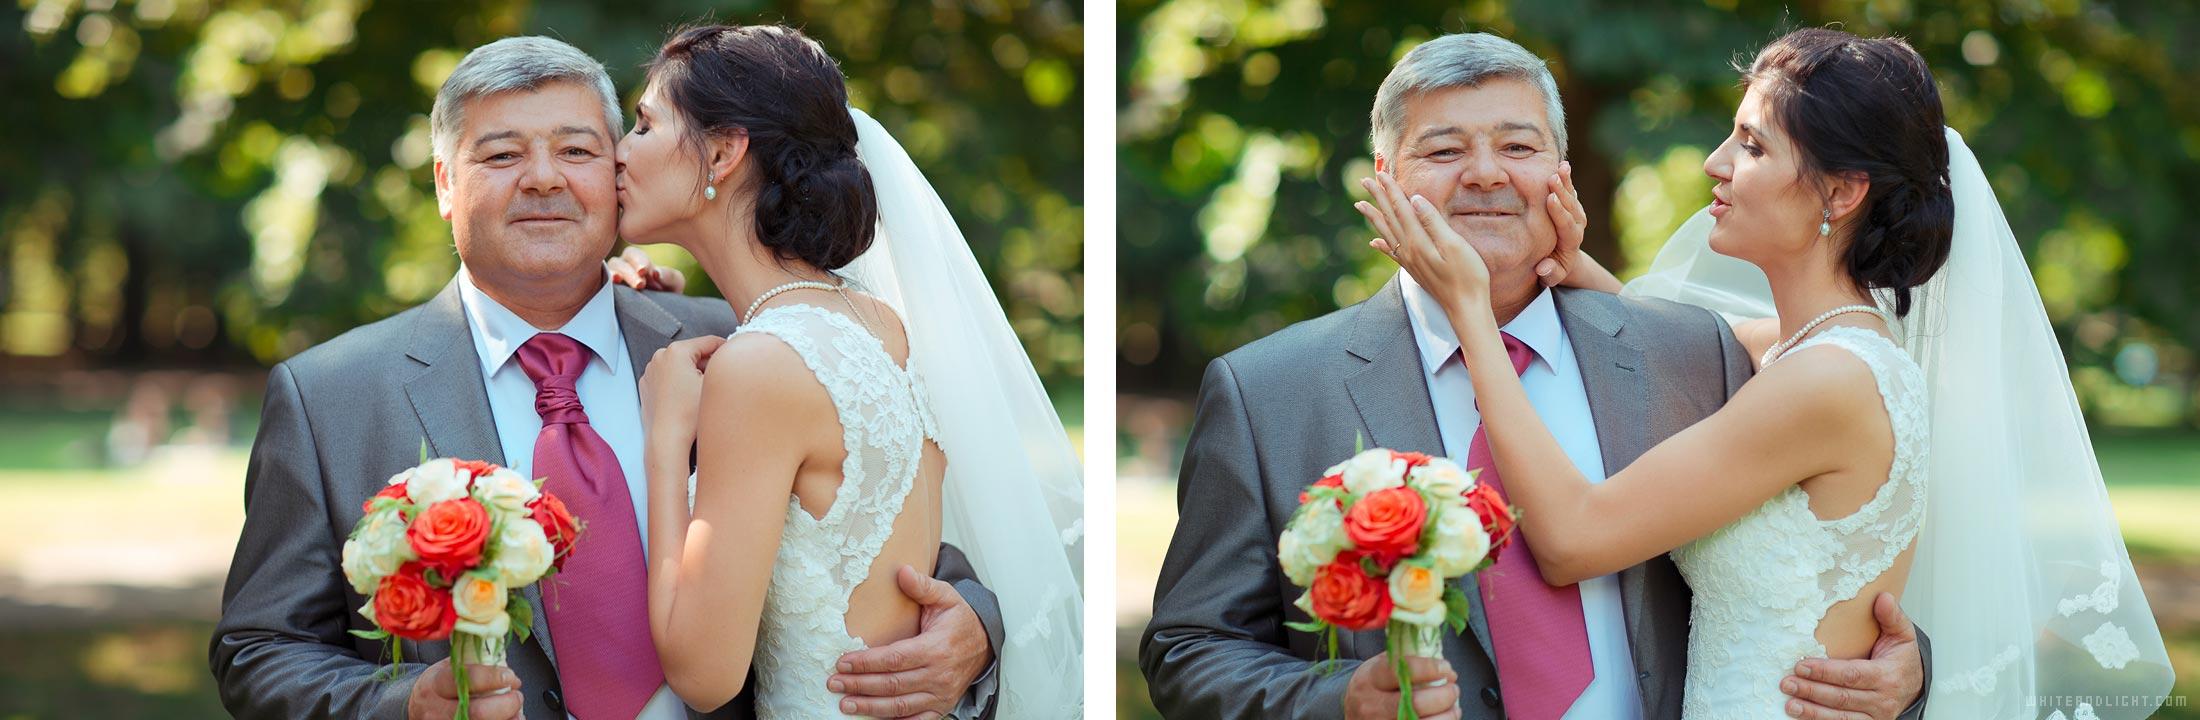 Photography in Munich Germany -weddingbackground